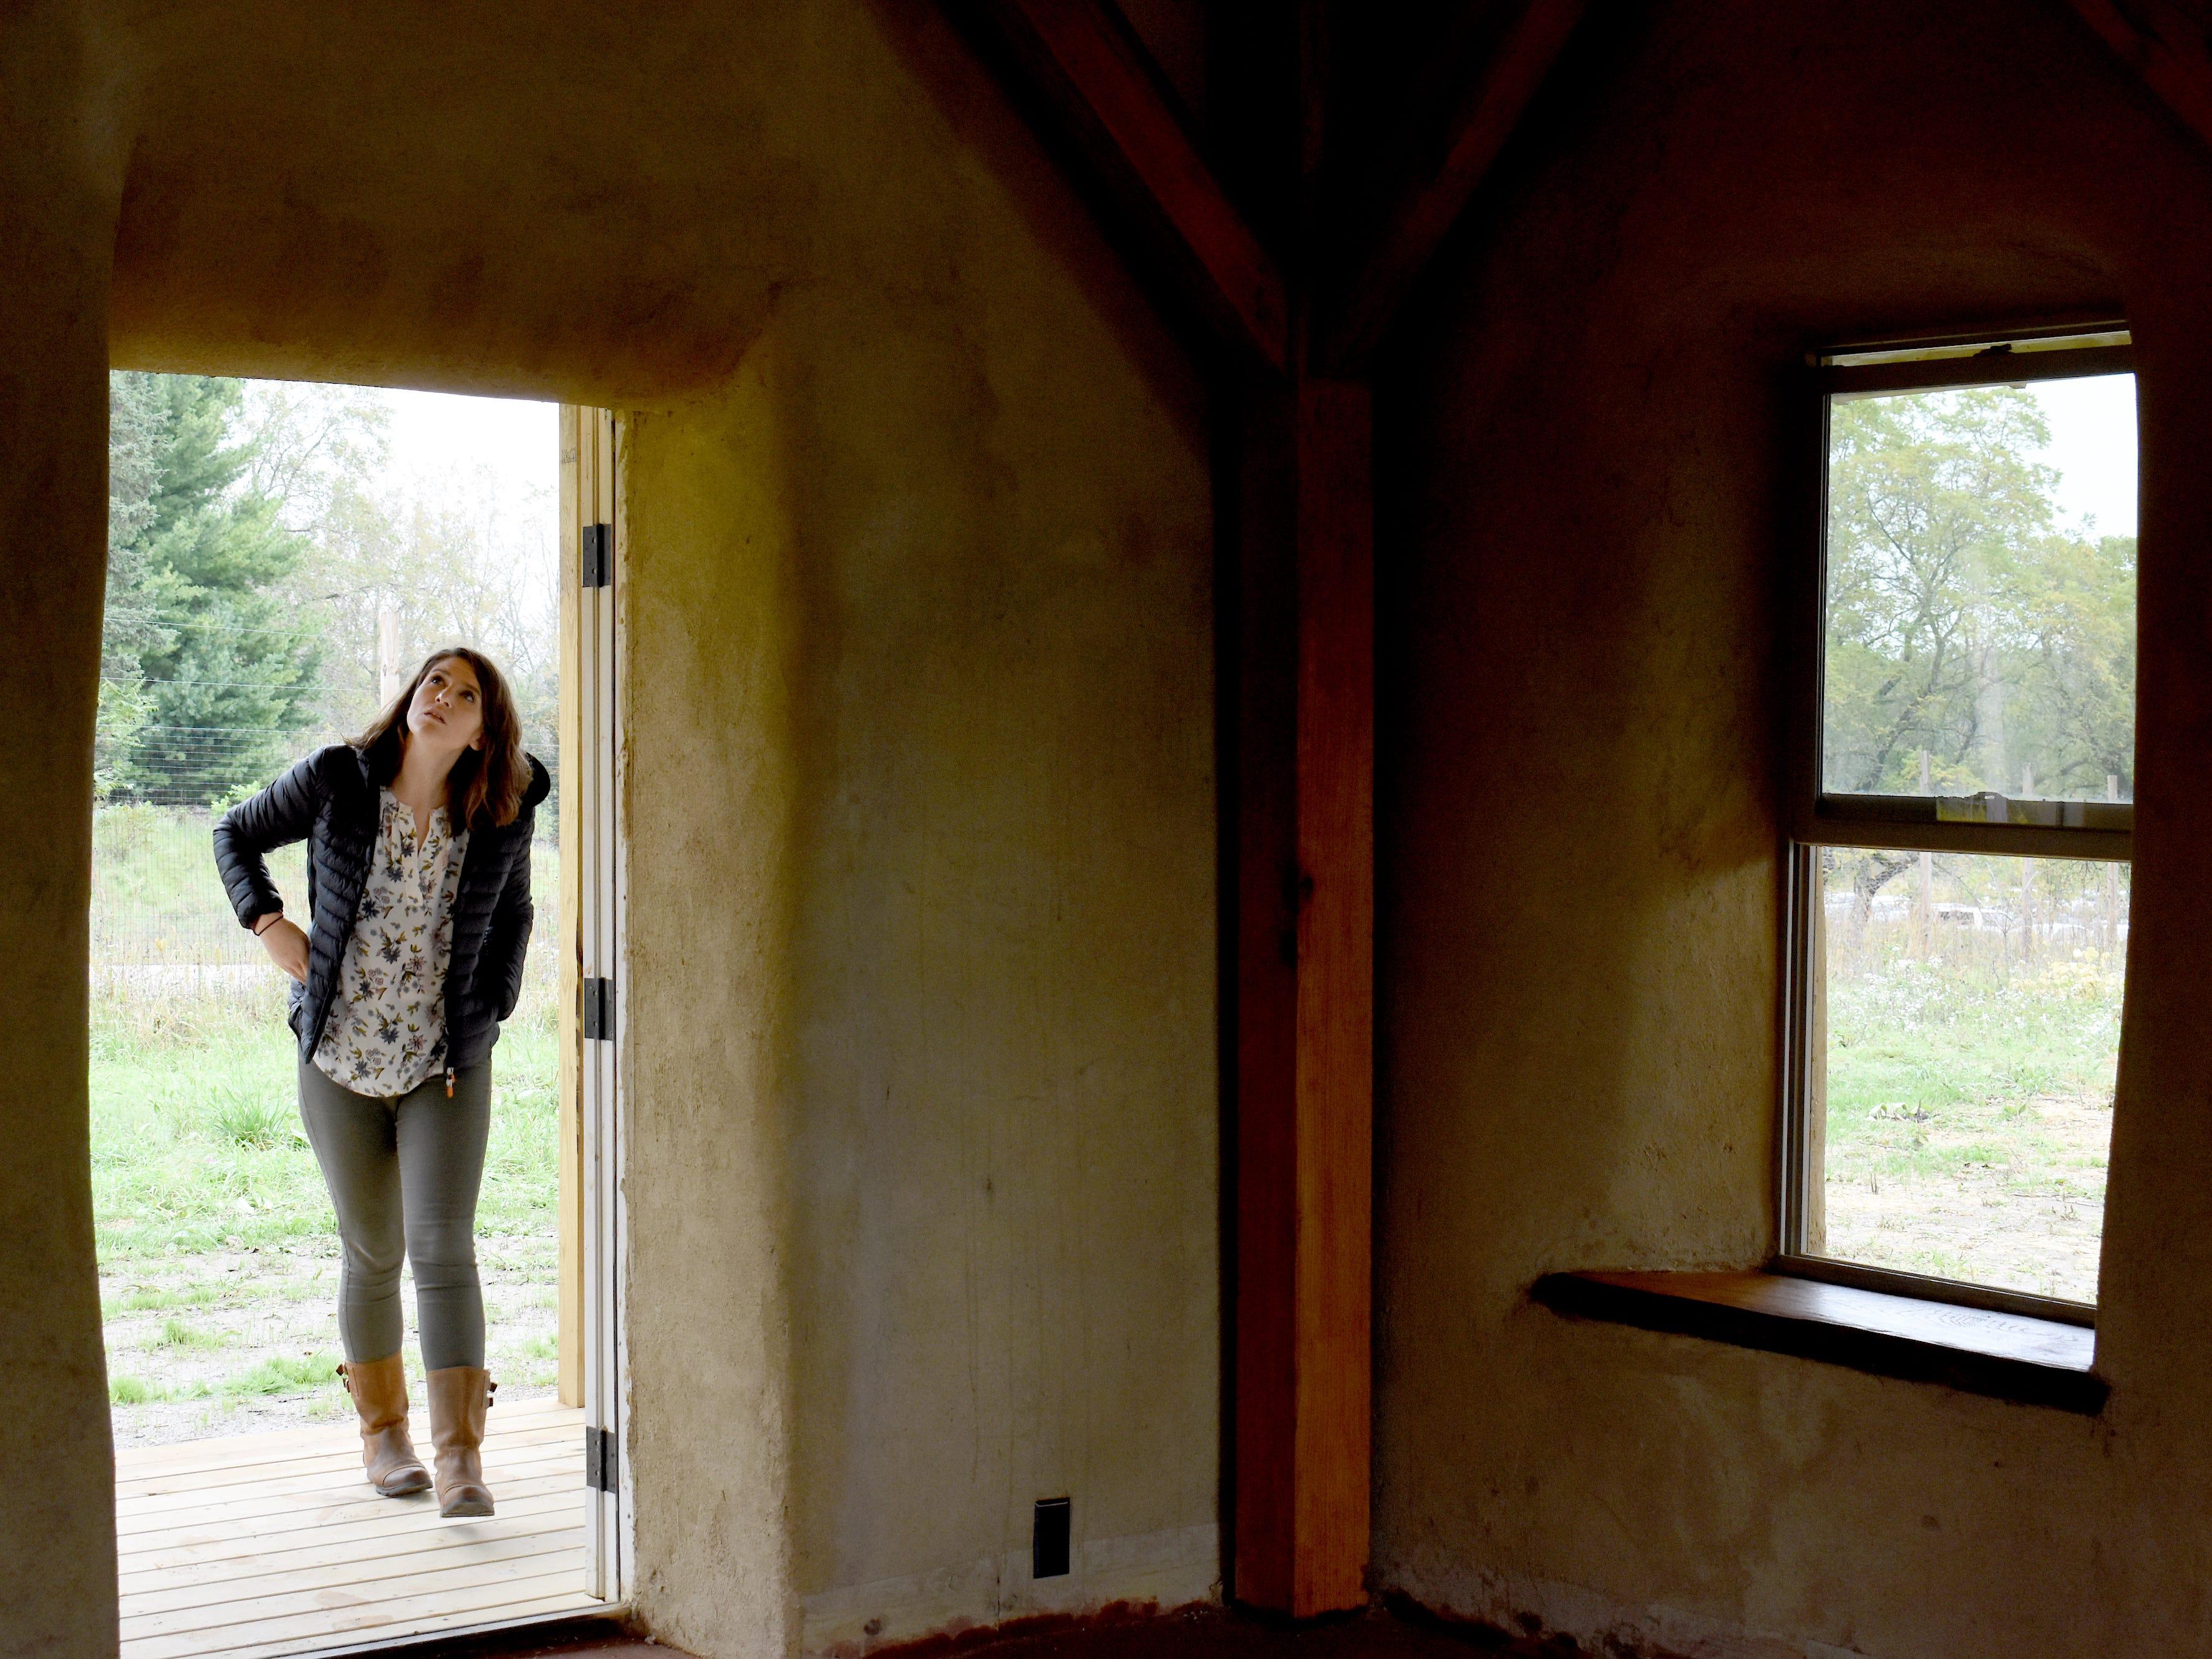 UM Architecture alumnus Loran Newman, 27, of Chicago, examines the Straw Bale Building.